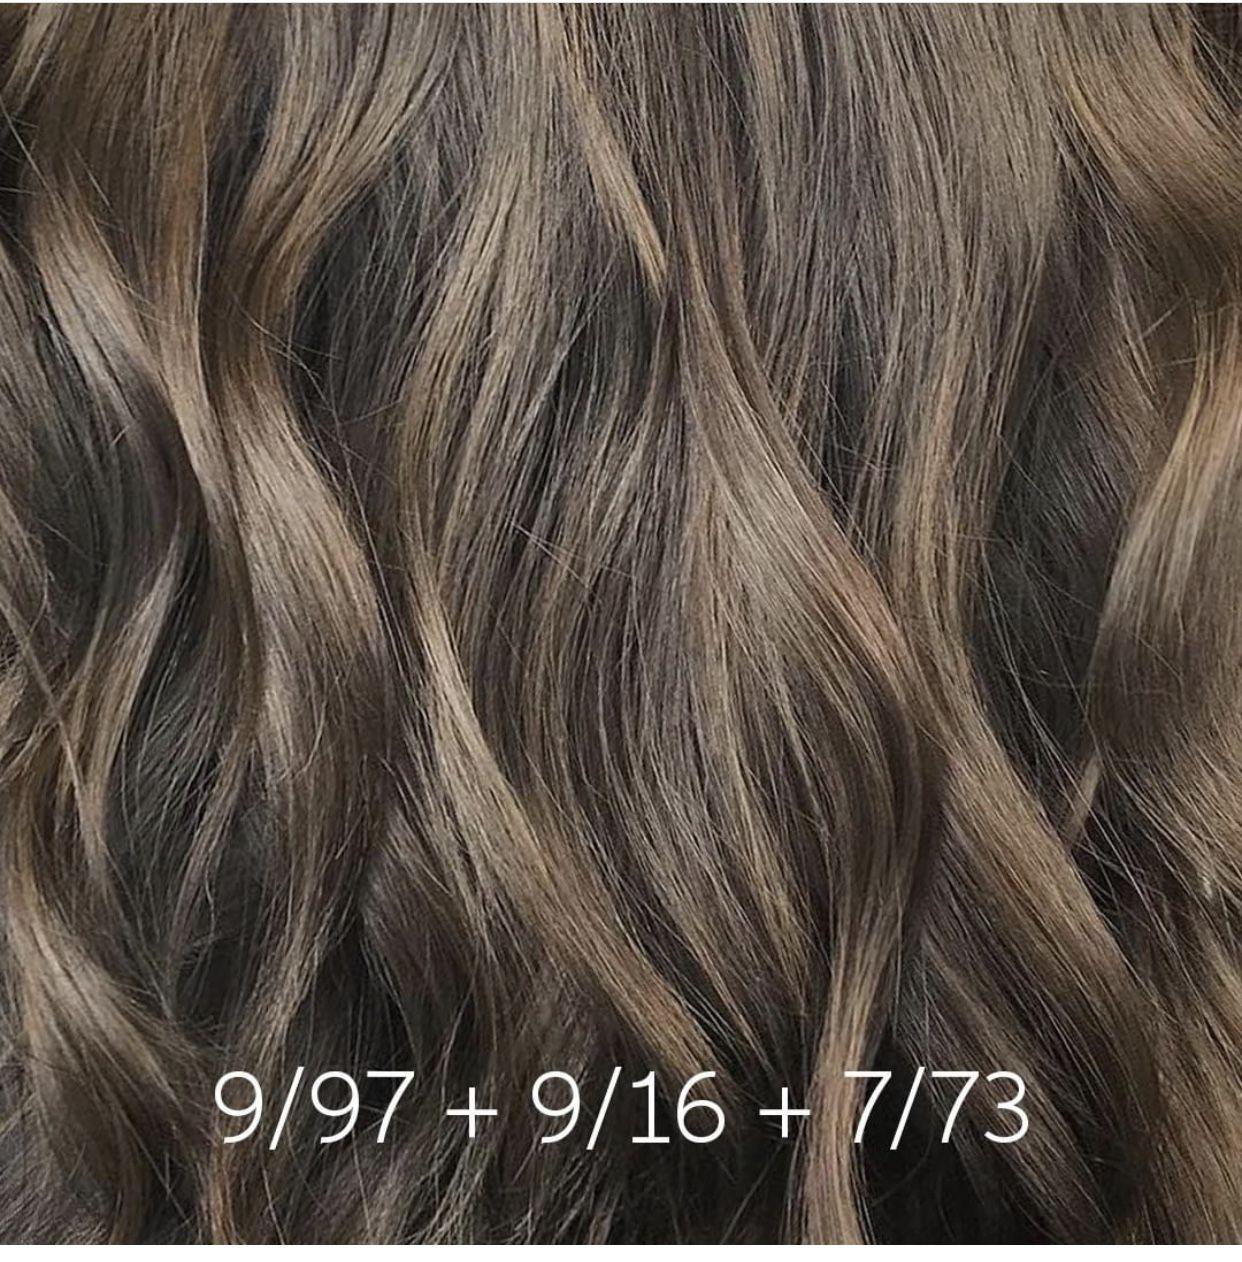 42+ Mushroom brown hair color formula matrix ideas in 2021